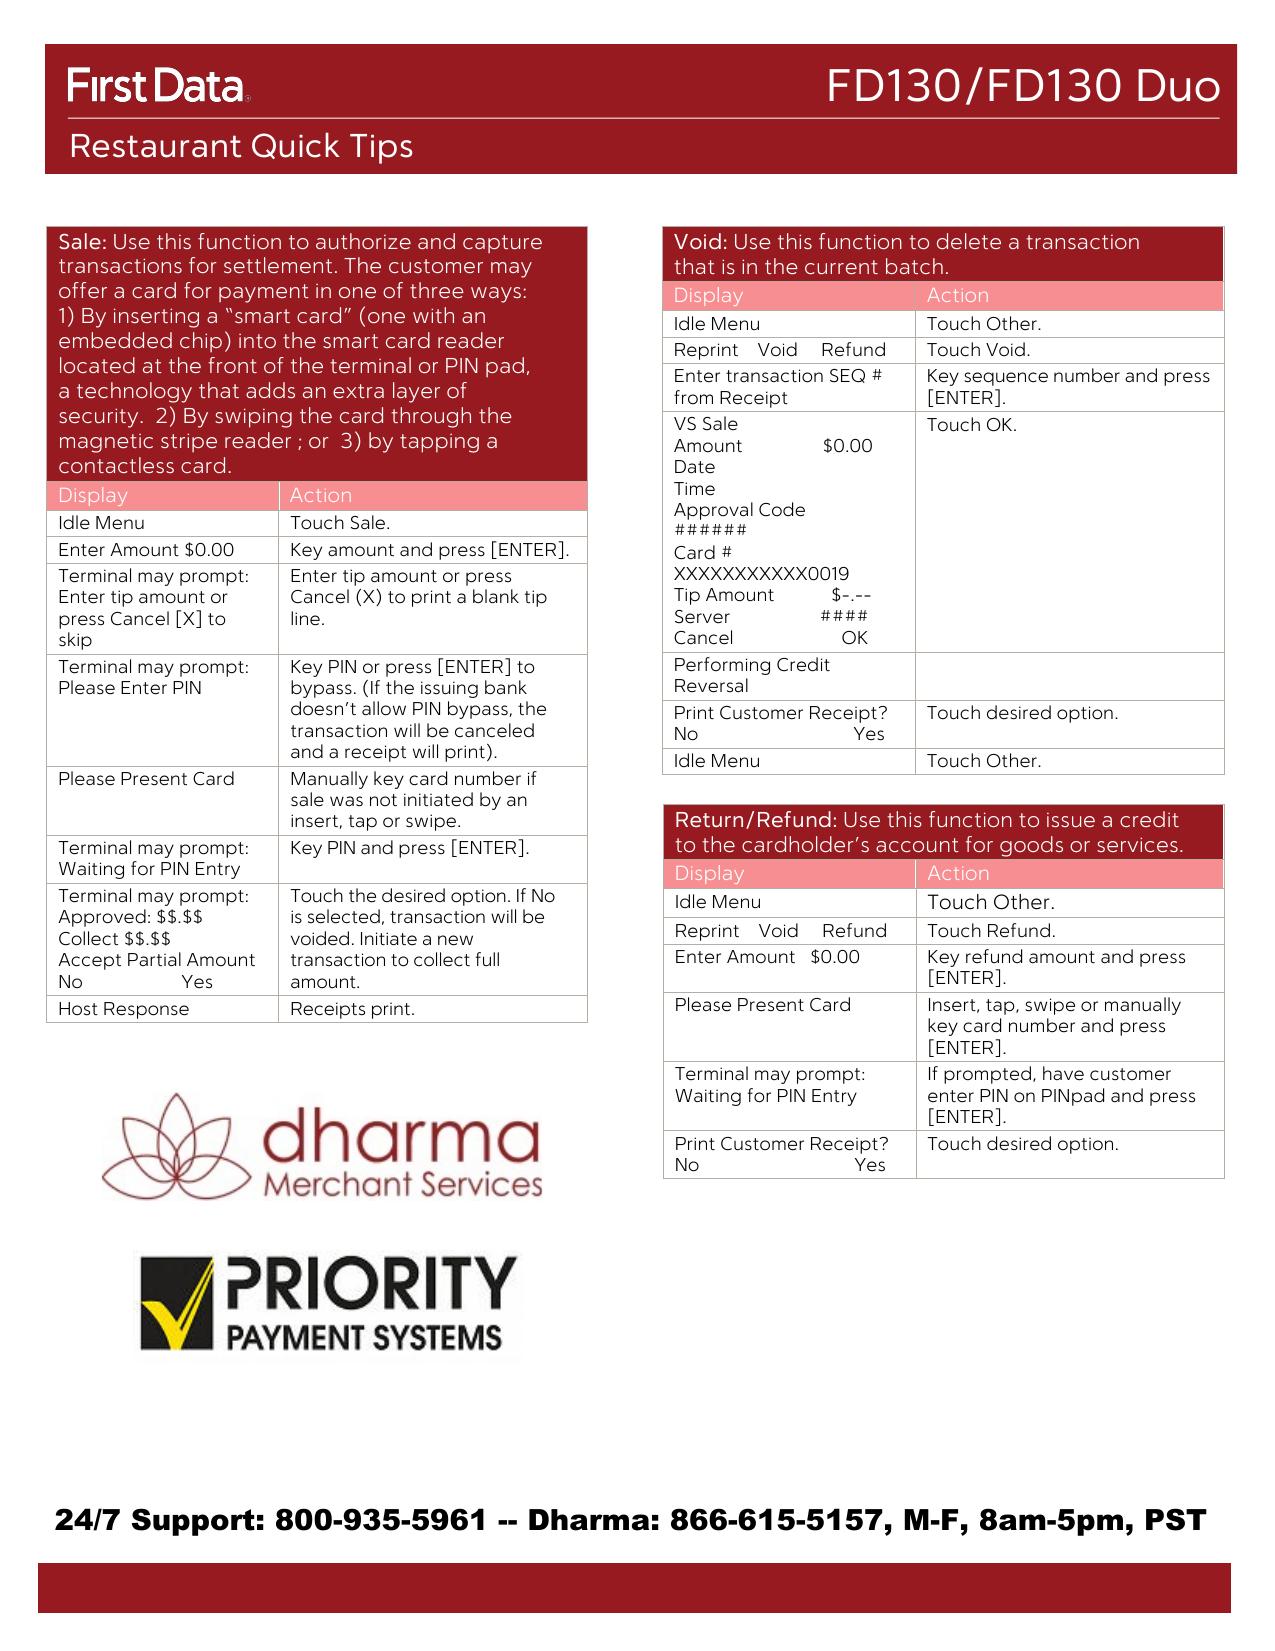 FD130/FD130 Duo - Dharma Merchant Services | manualzz com